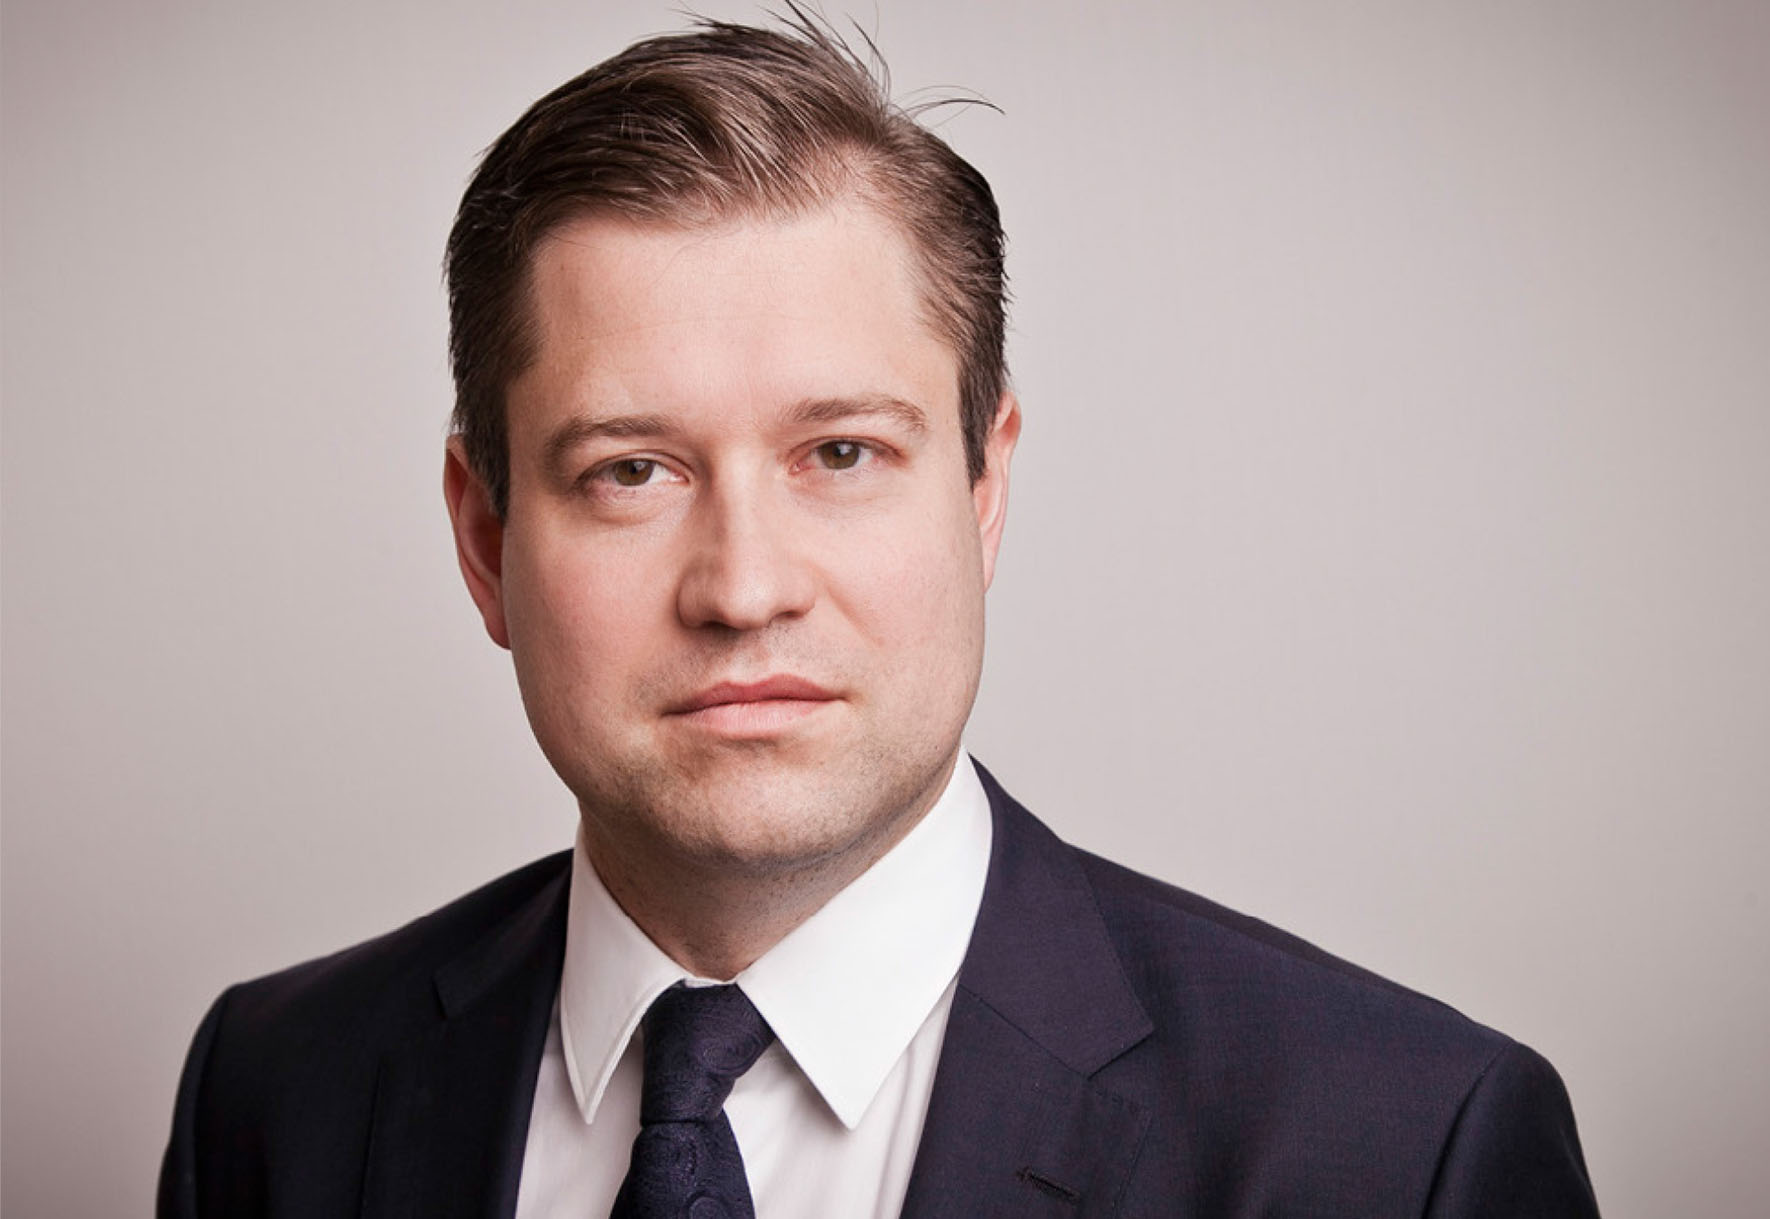 Michael Koralewski